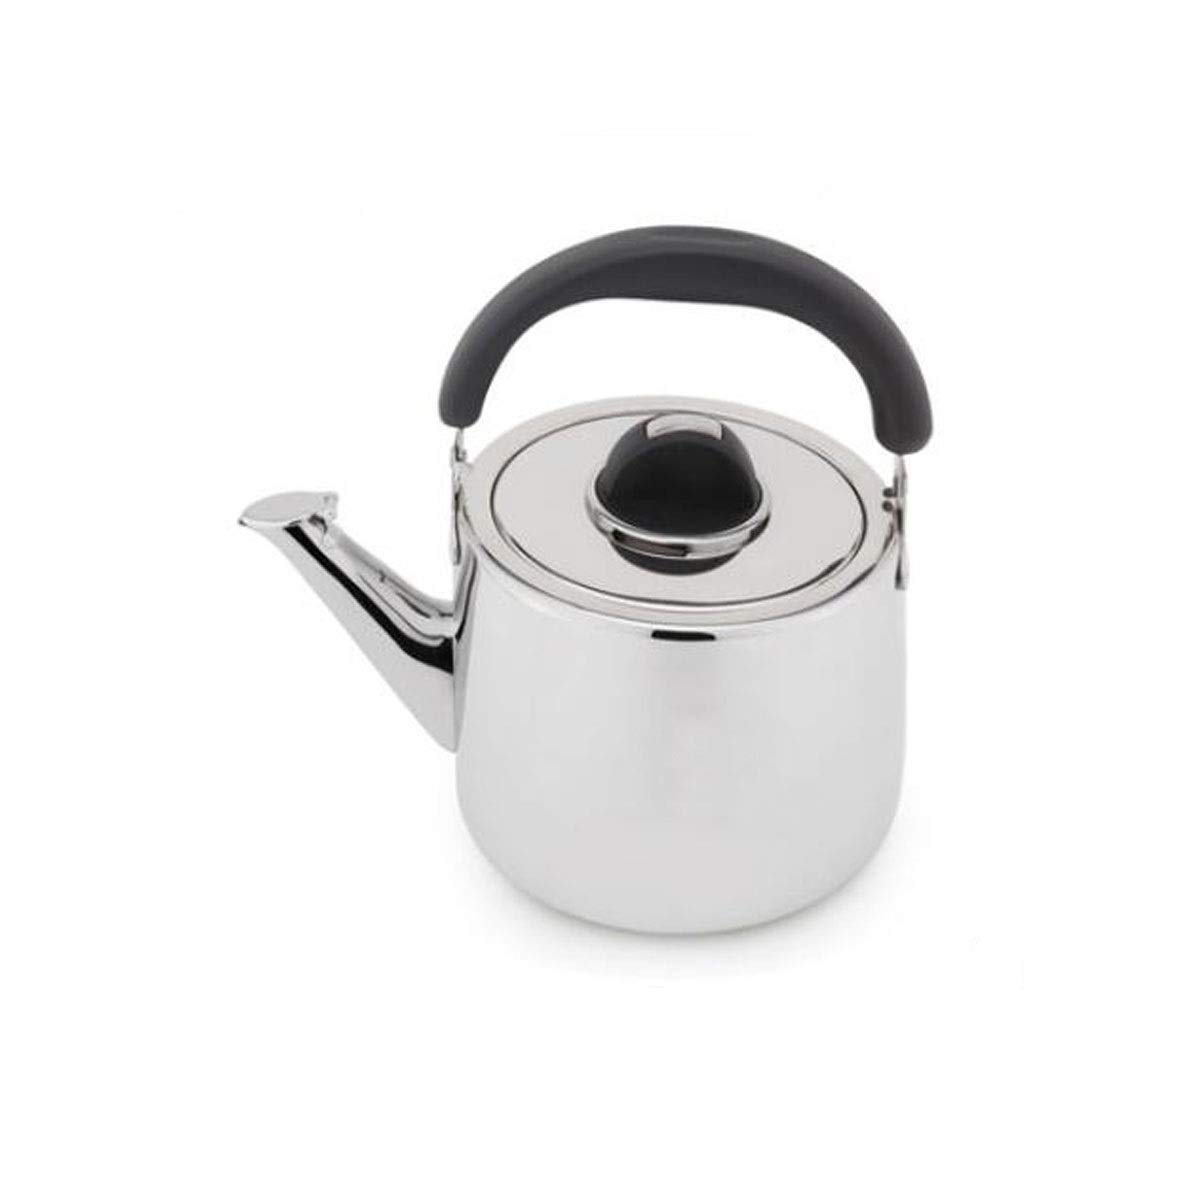 Caldera, adecuada para la cocina del hogar, caldera espesada de ...